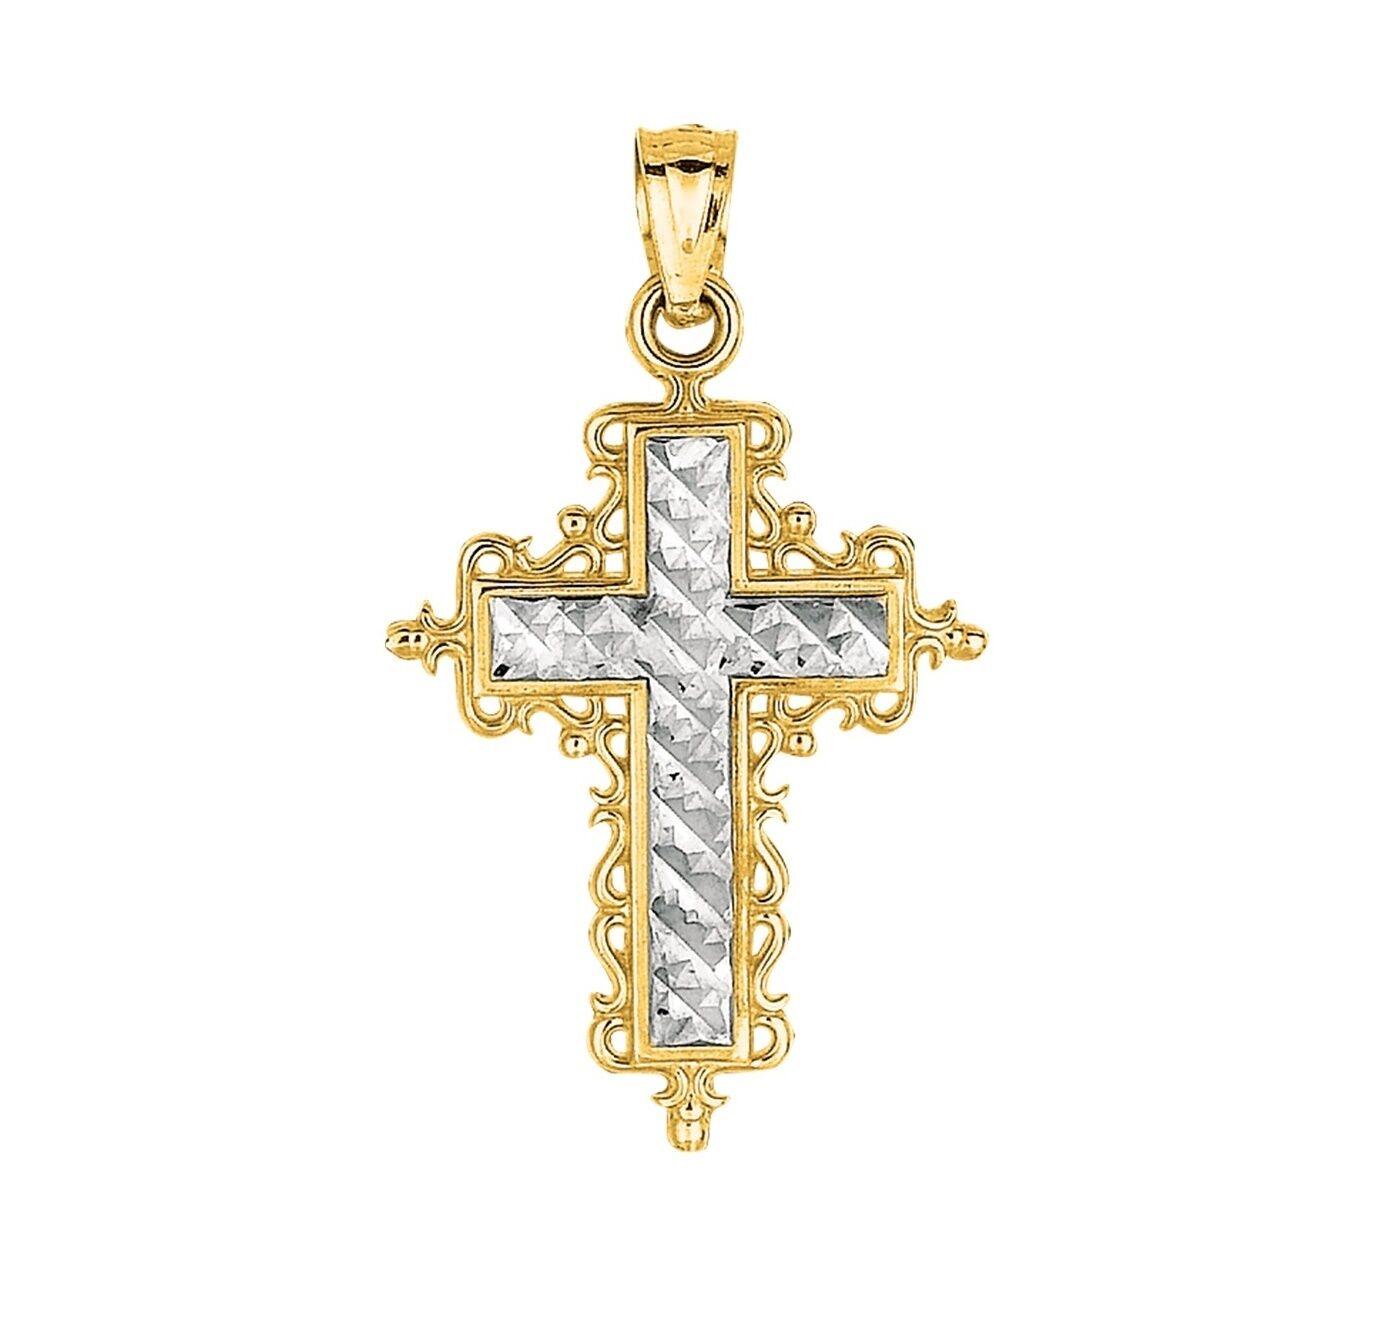 14K Yellow White gold Shiny Squared Fancy Filigree Trim Cross Pendant